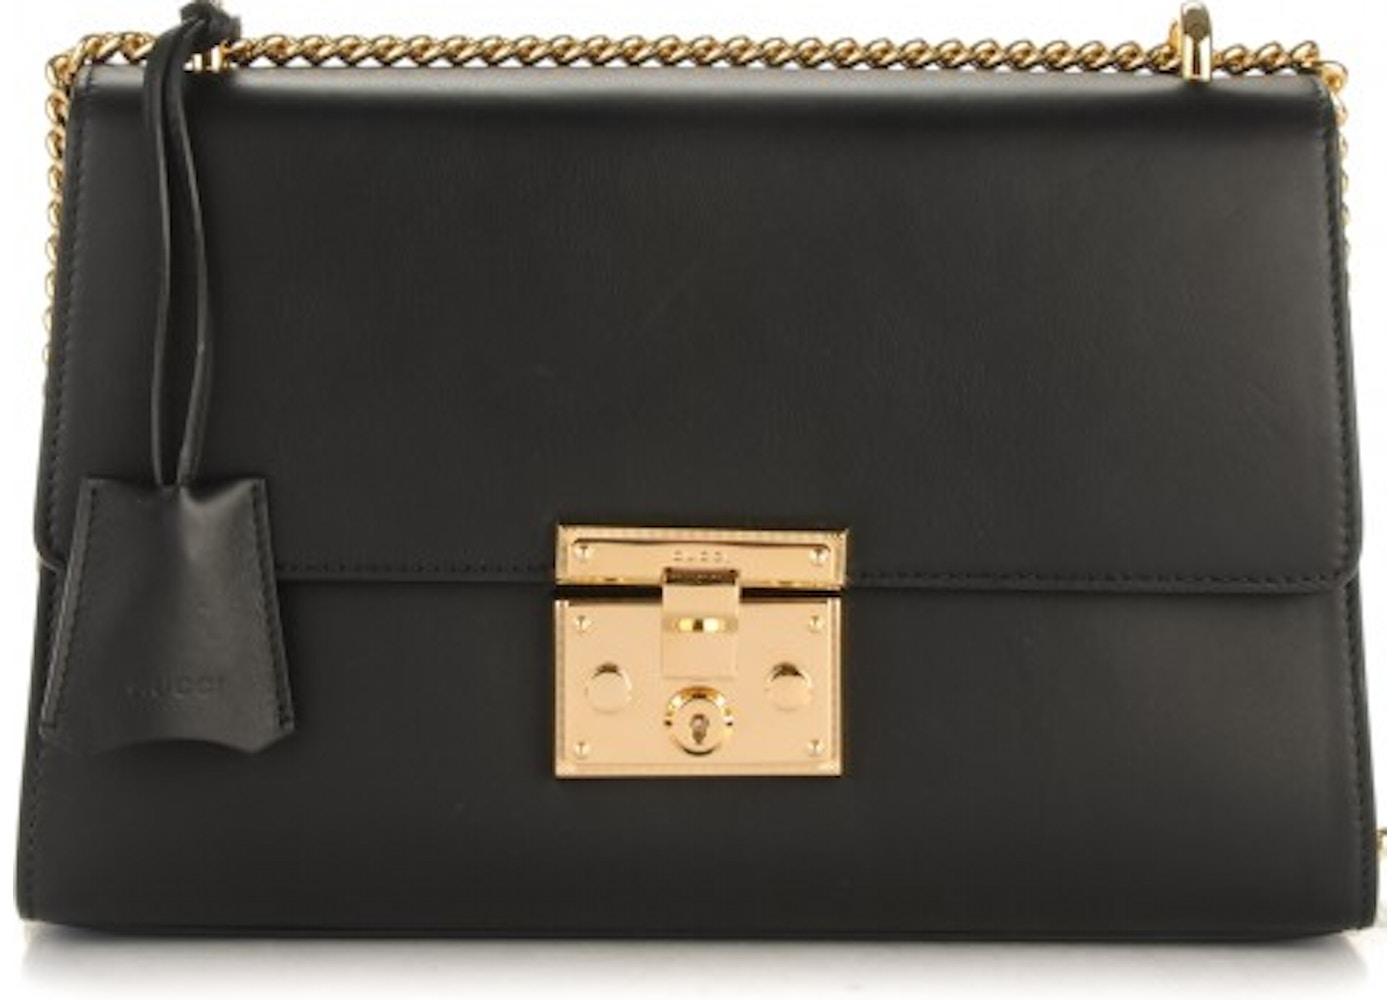 b124cc76 Gucci Padlock Shoulder Bag Medium Black. Medium Black